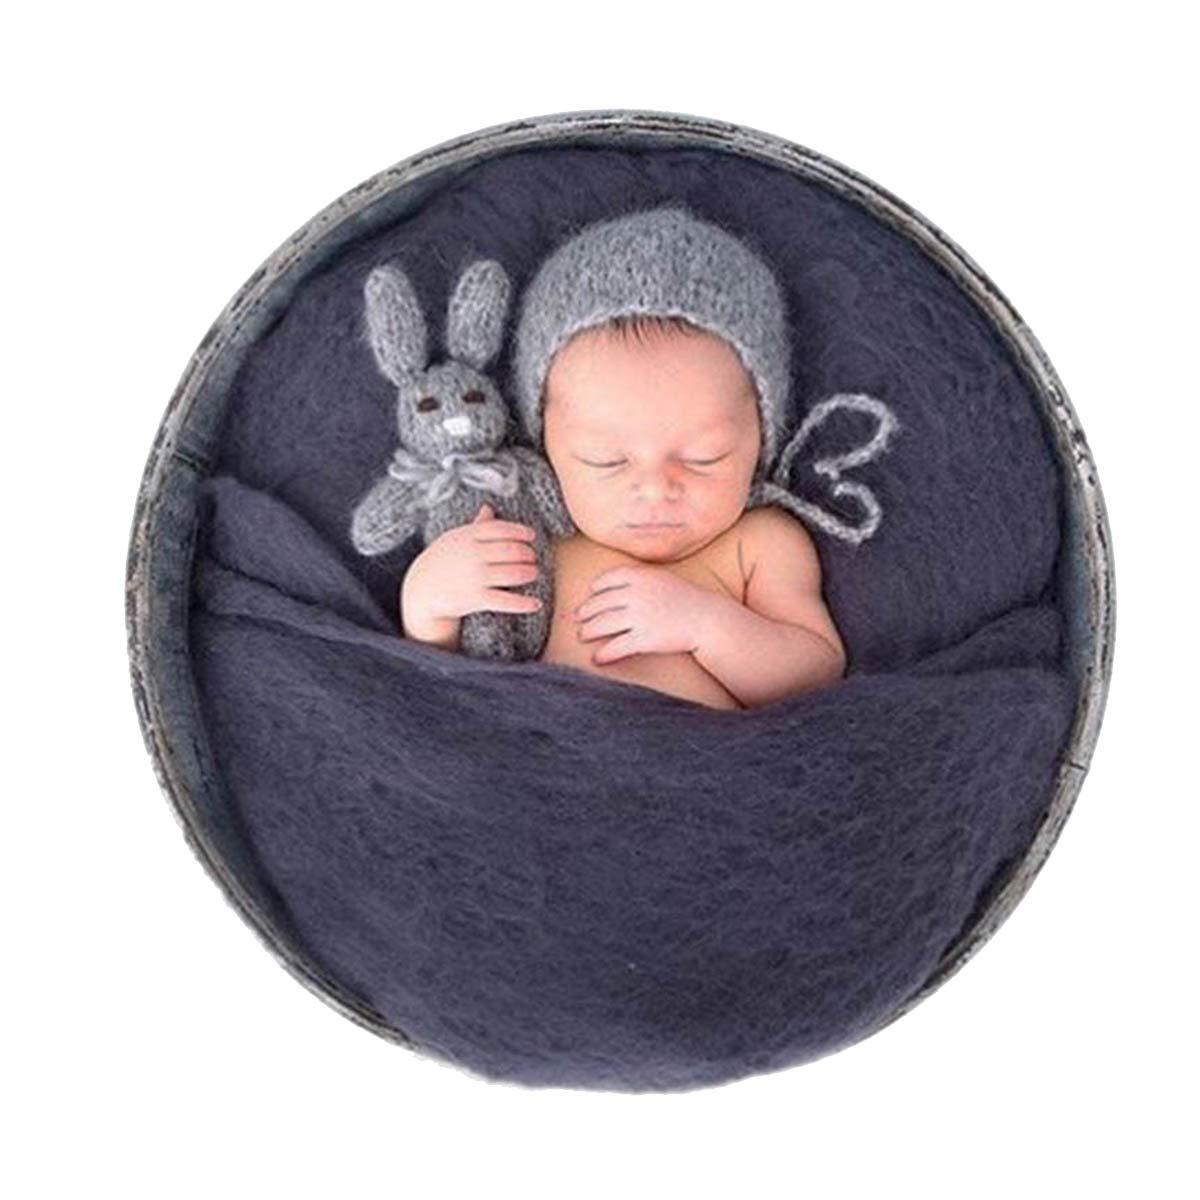 Sunmig Newborn Baby Wool Fluff Photo Props Merino Basket Stuffer Basket Filler Rug Photography Prop (Grey)